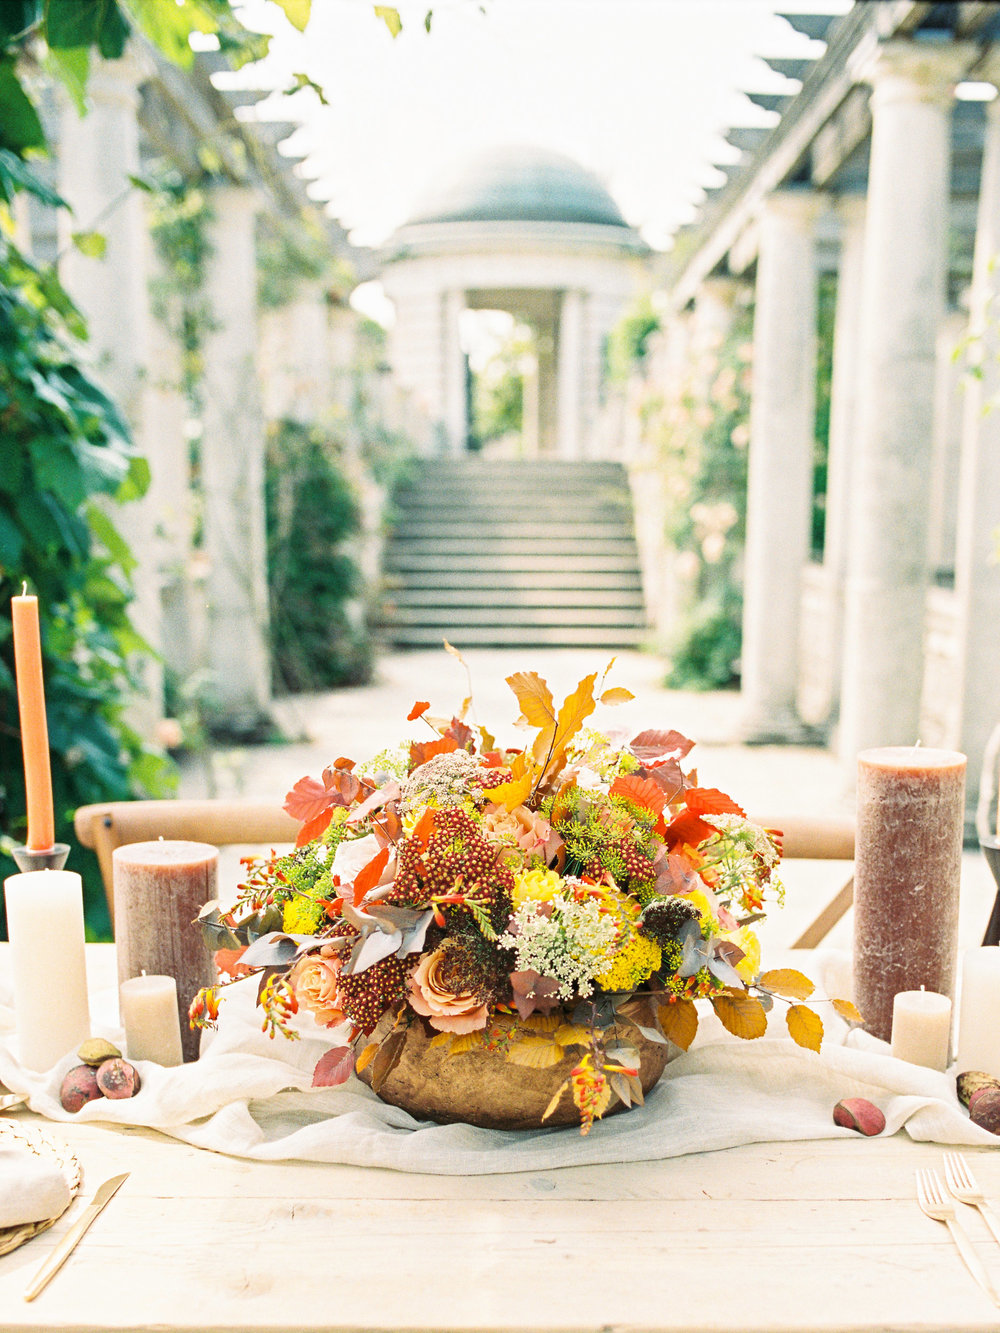 Amy O'Boyle Photography- Destination & UK Fine Art Film Wedding Photographer- The Pergola and Hill Garden Wedding-35.jpg